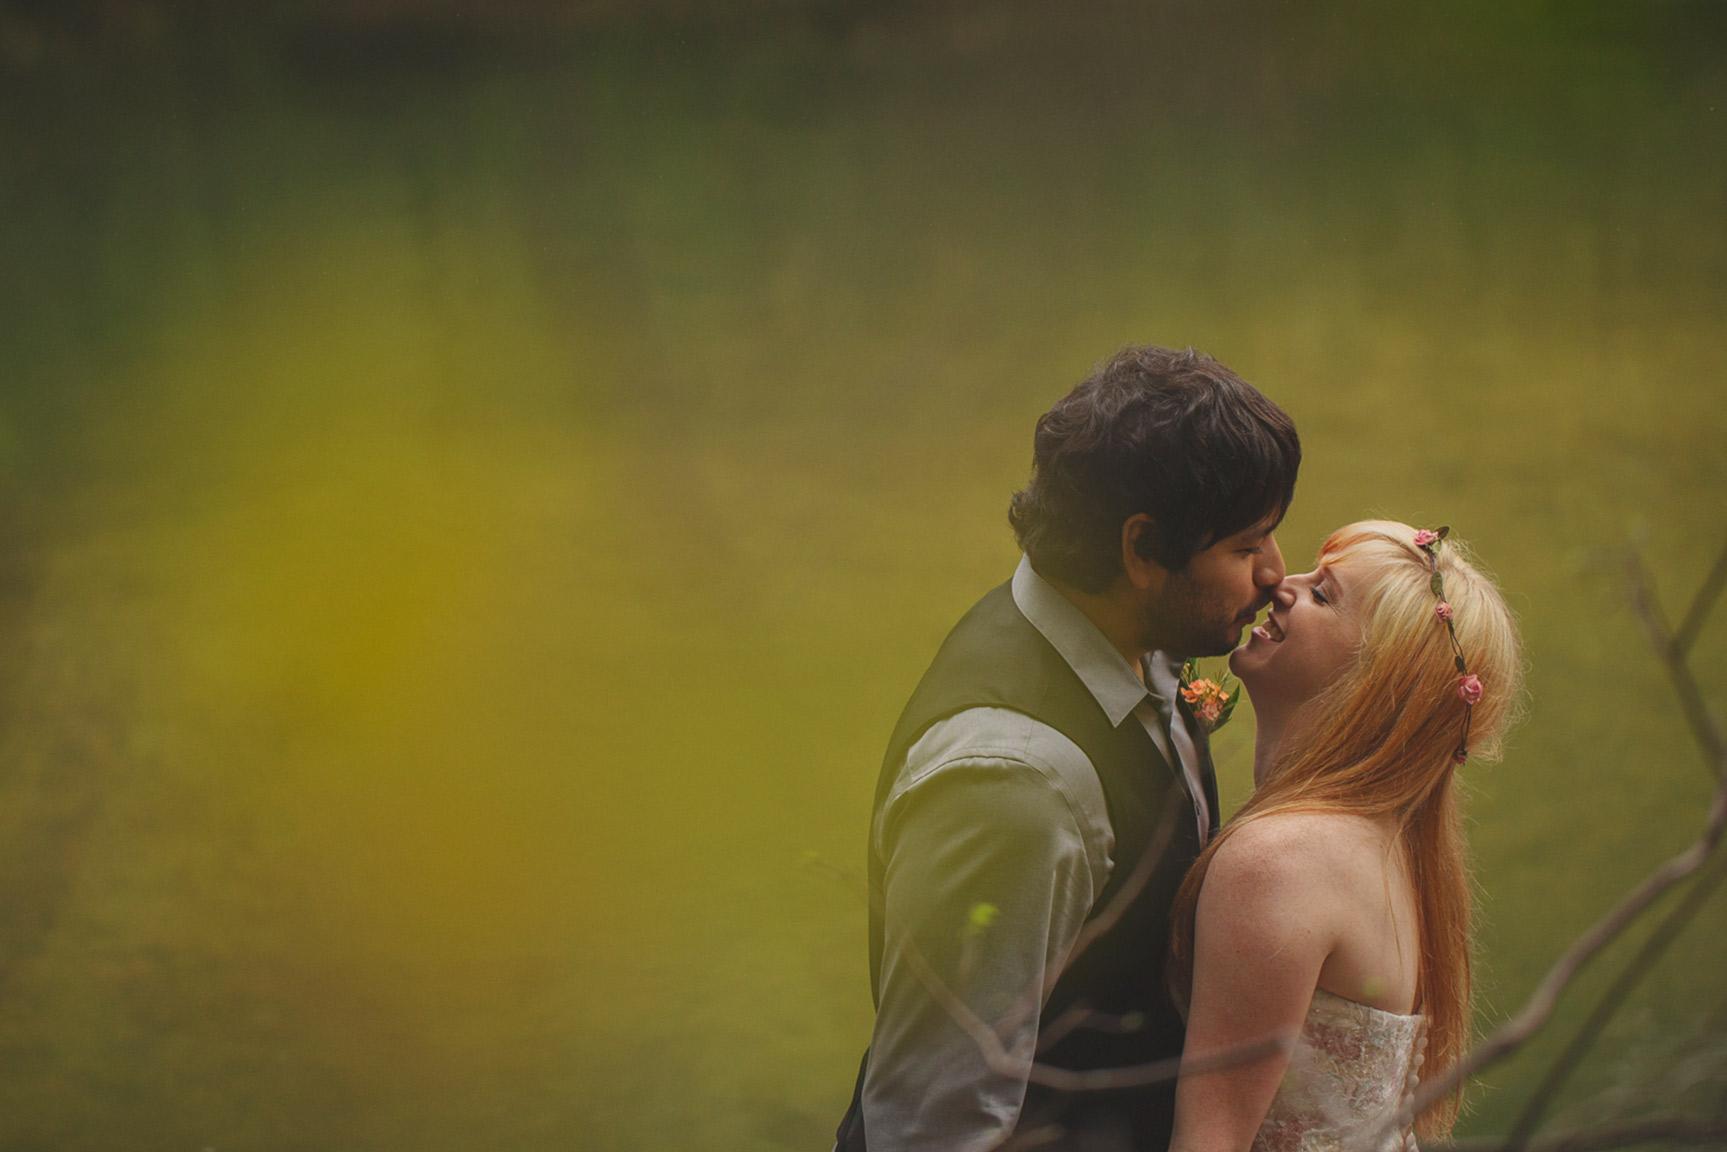 PhotobyBetsy-elopement015.jpg